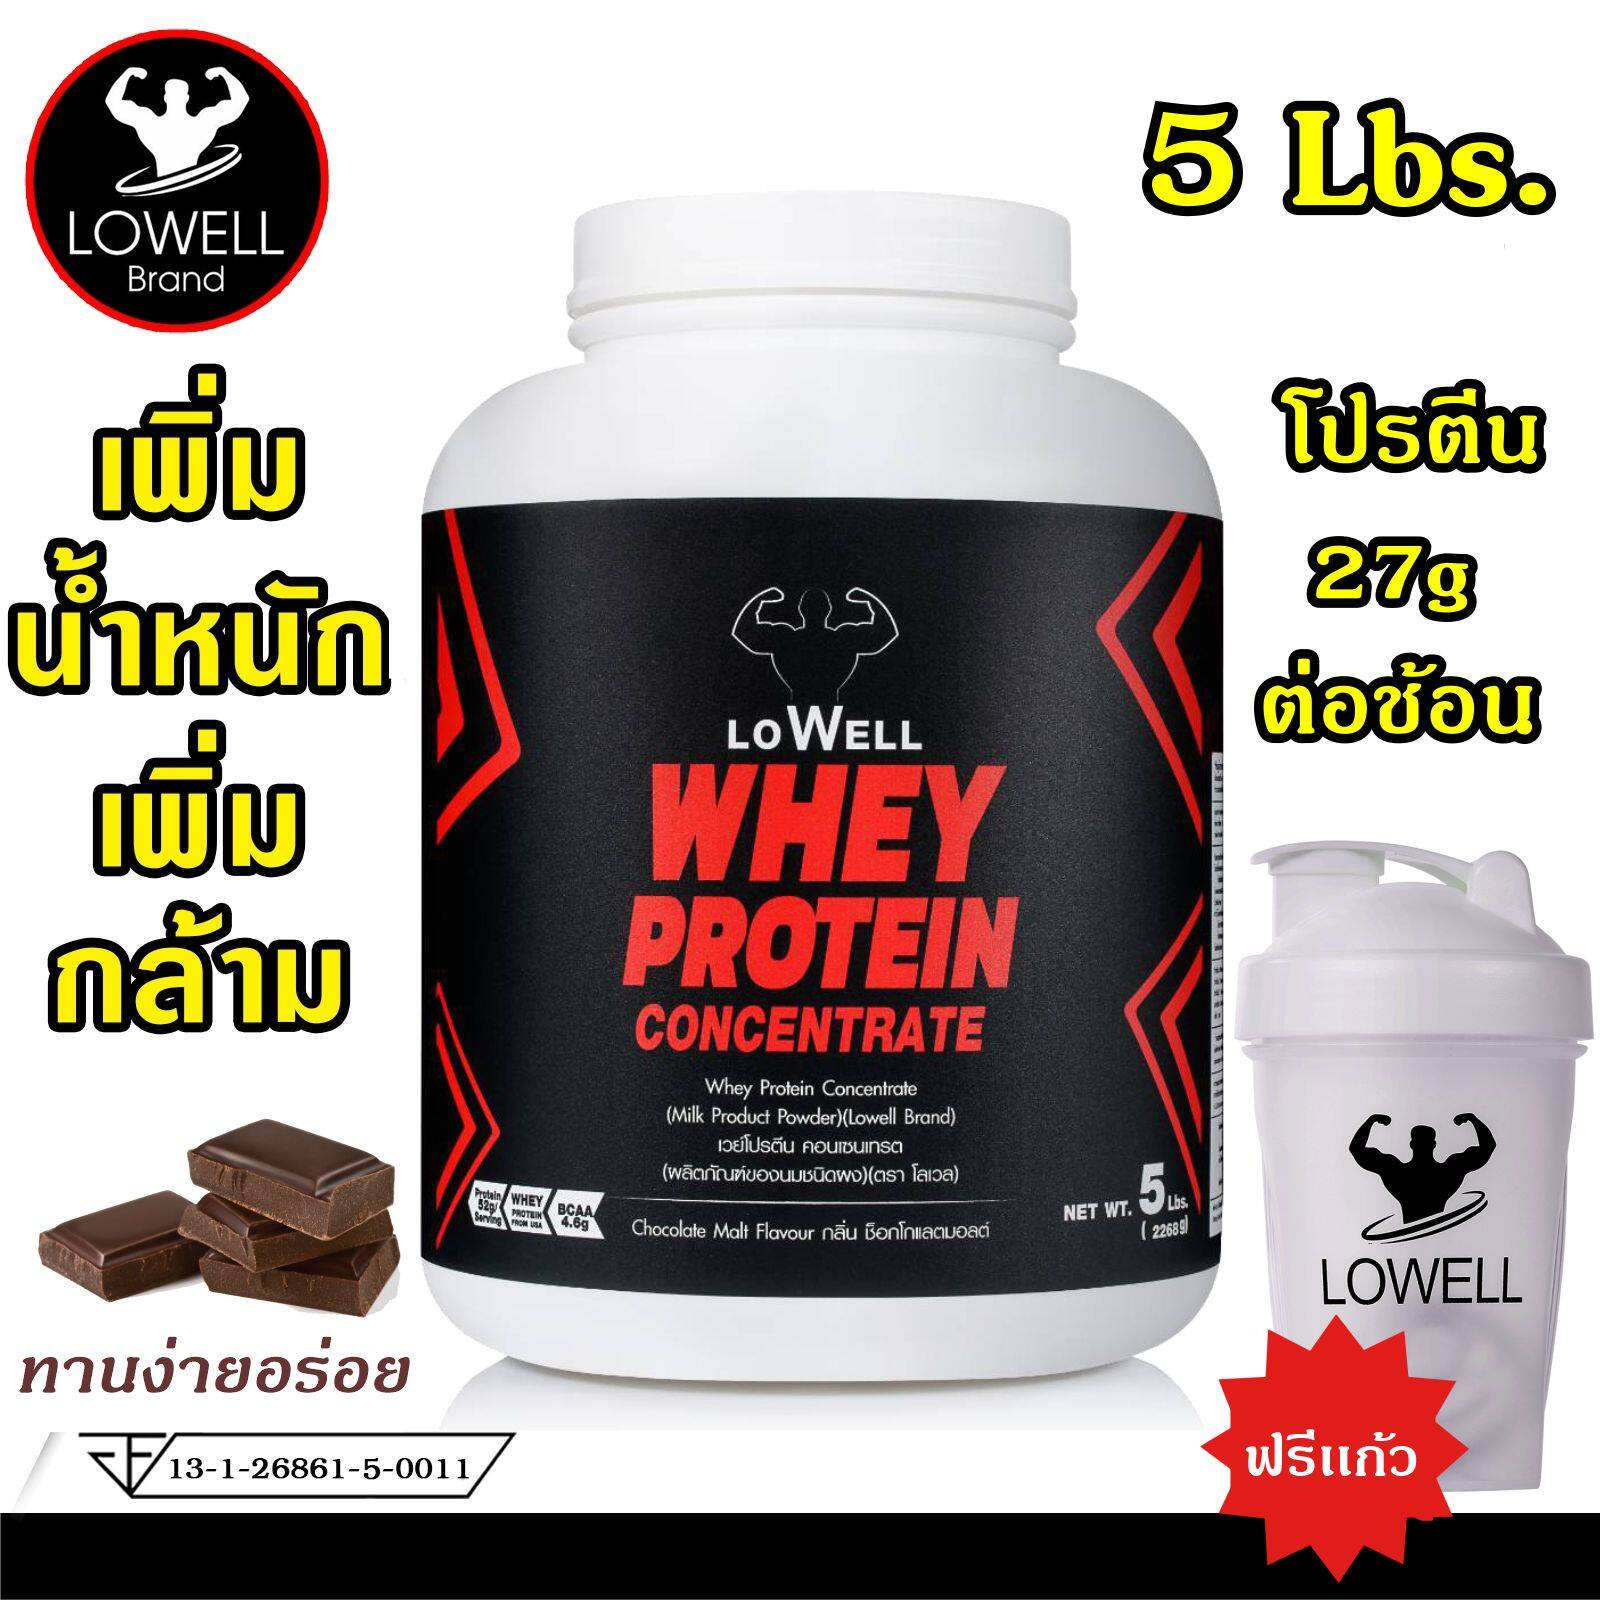 Lowell เวย์โปรตีน เพิ่มน้ำหนัก เพิ่มกล้าม รสช็อกโกเเลต Whey Protein Concentrate  โปรตีน โปรตีนเวย์ ขนาด 5ปอนด์ เเบบกระปุก.